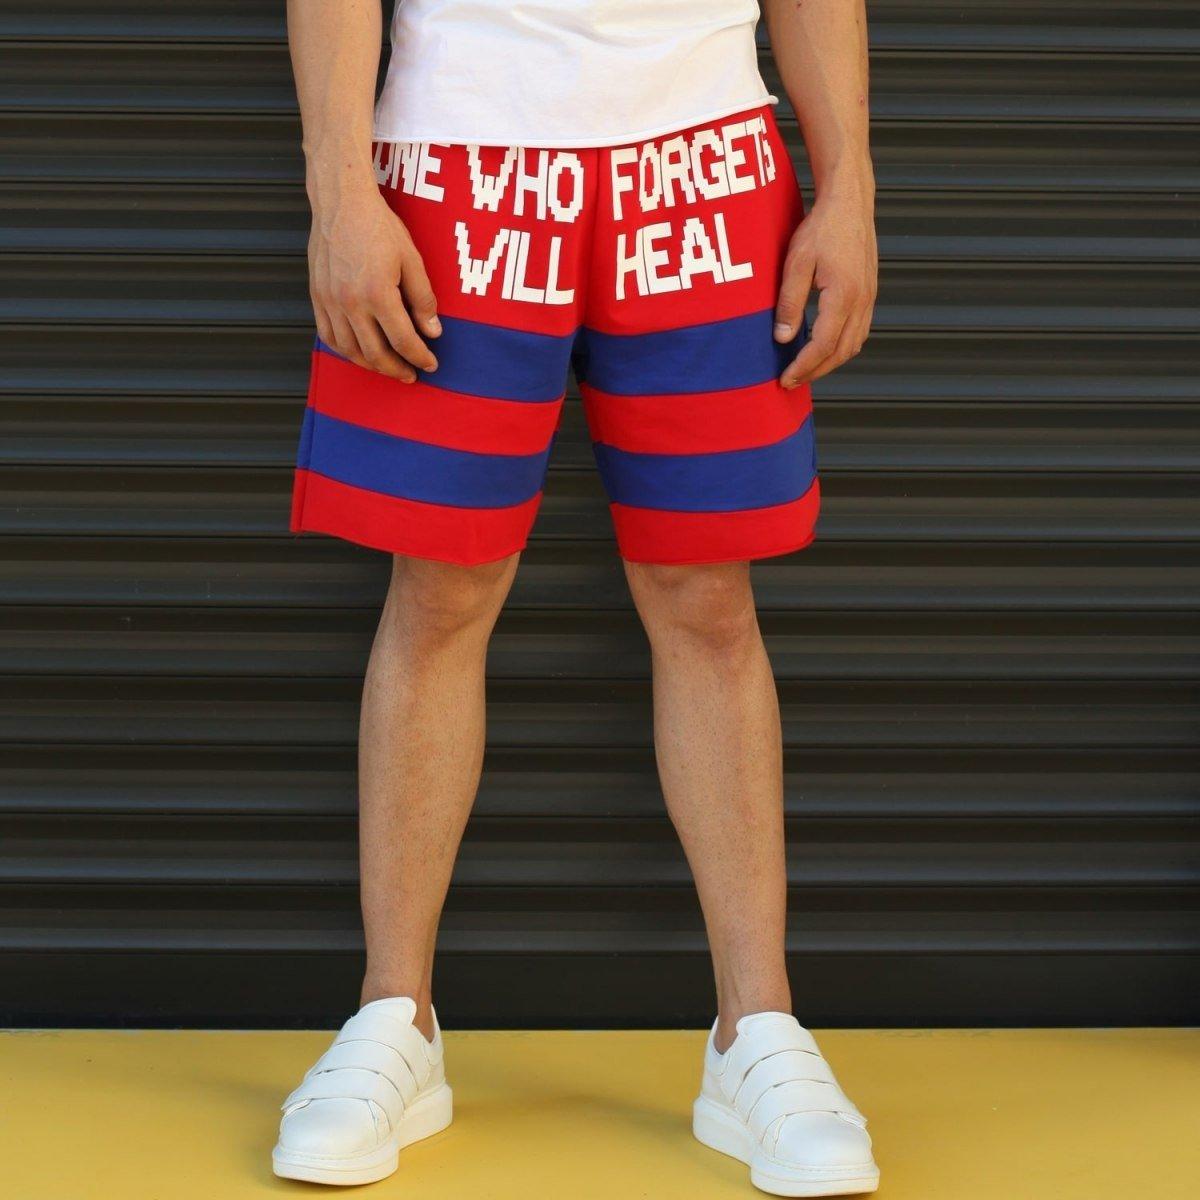 Men's Who Forgets Will Heal Fleece Sport Shorts Red Mv Premium Brand - 1